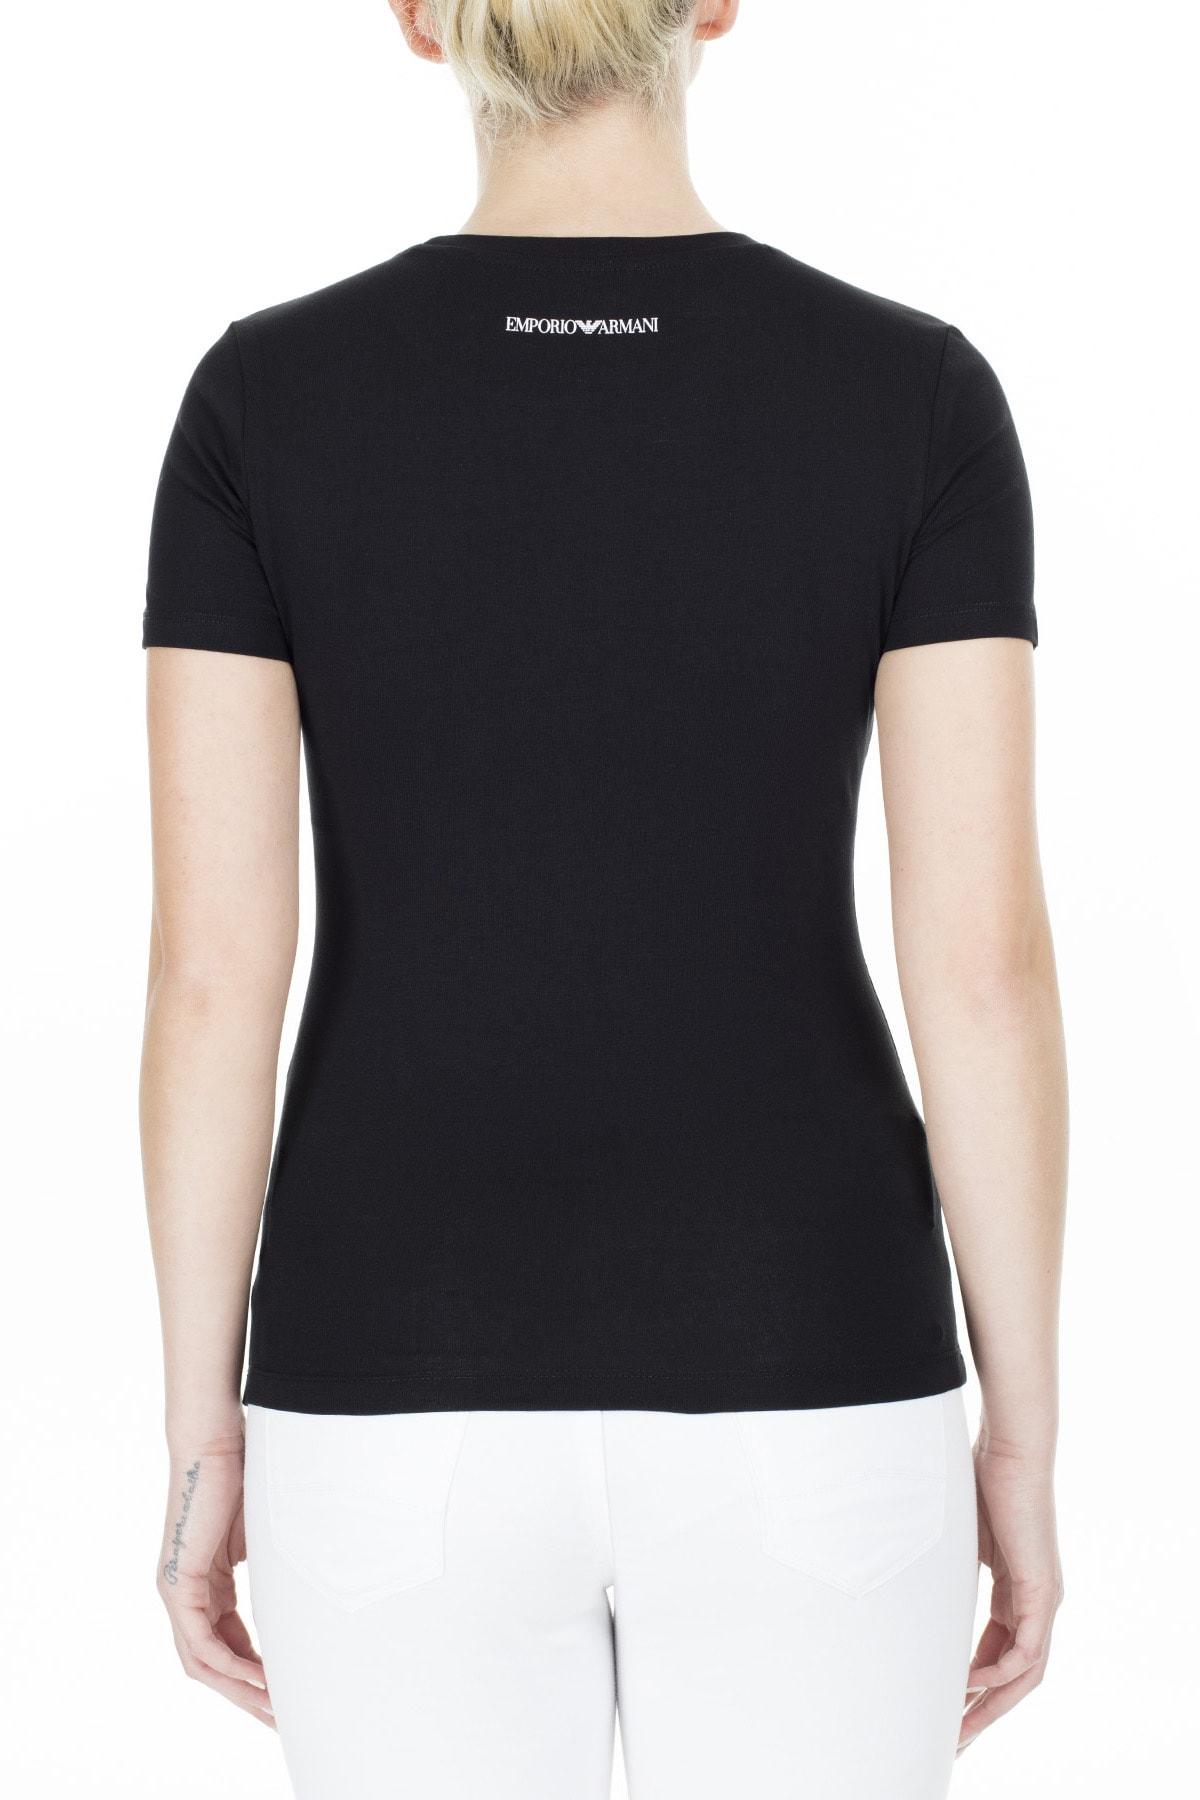 Emporio Armani Kadın Siyah T-Shirt 3H2T8A 2J07Z 0999 1